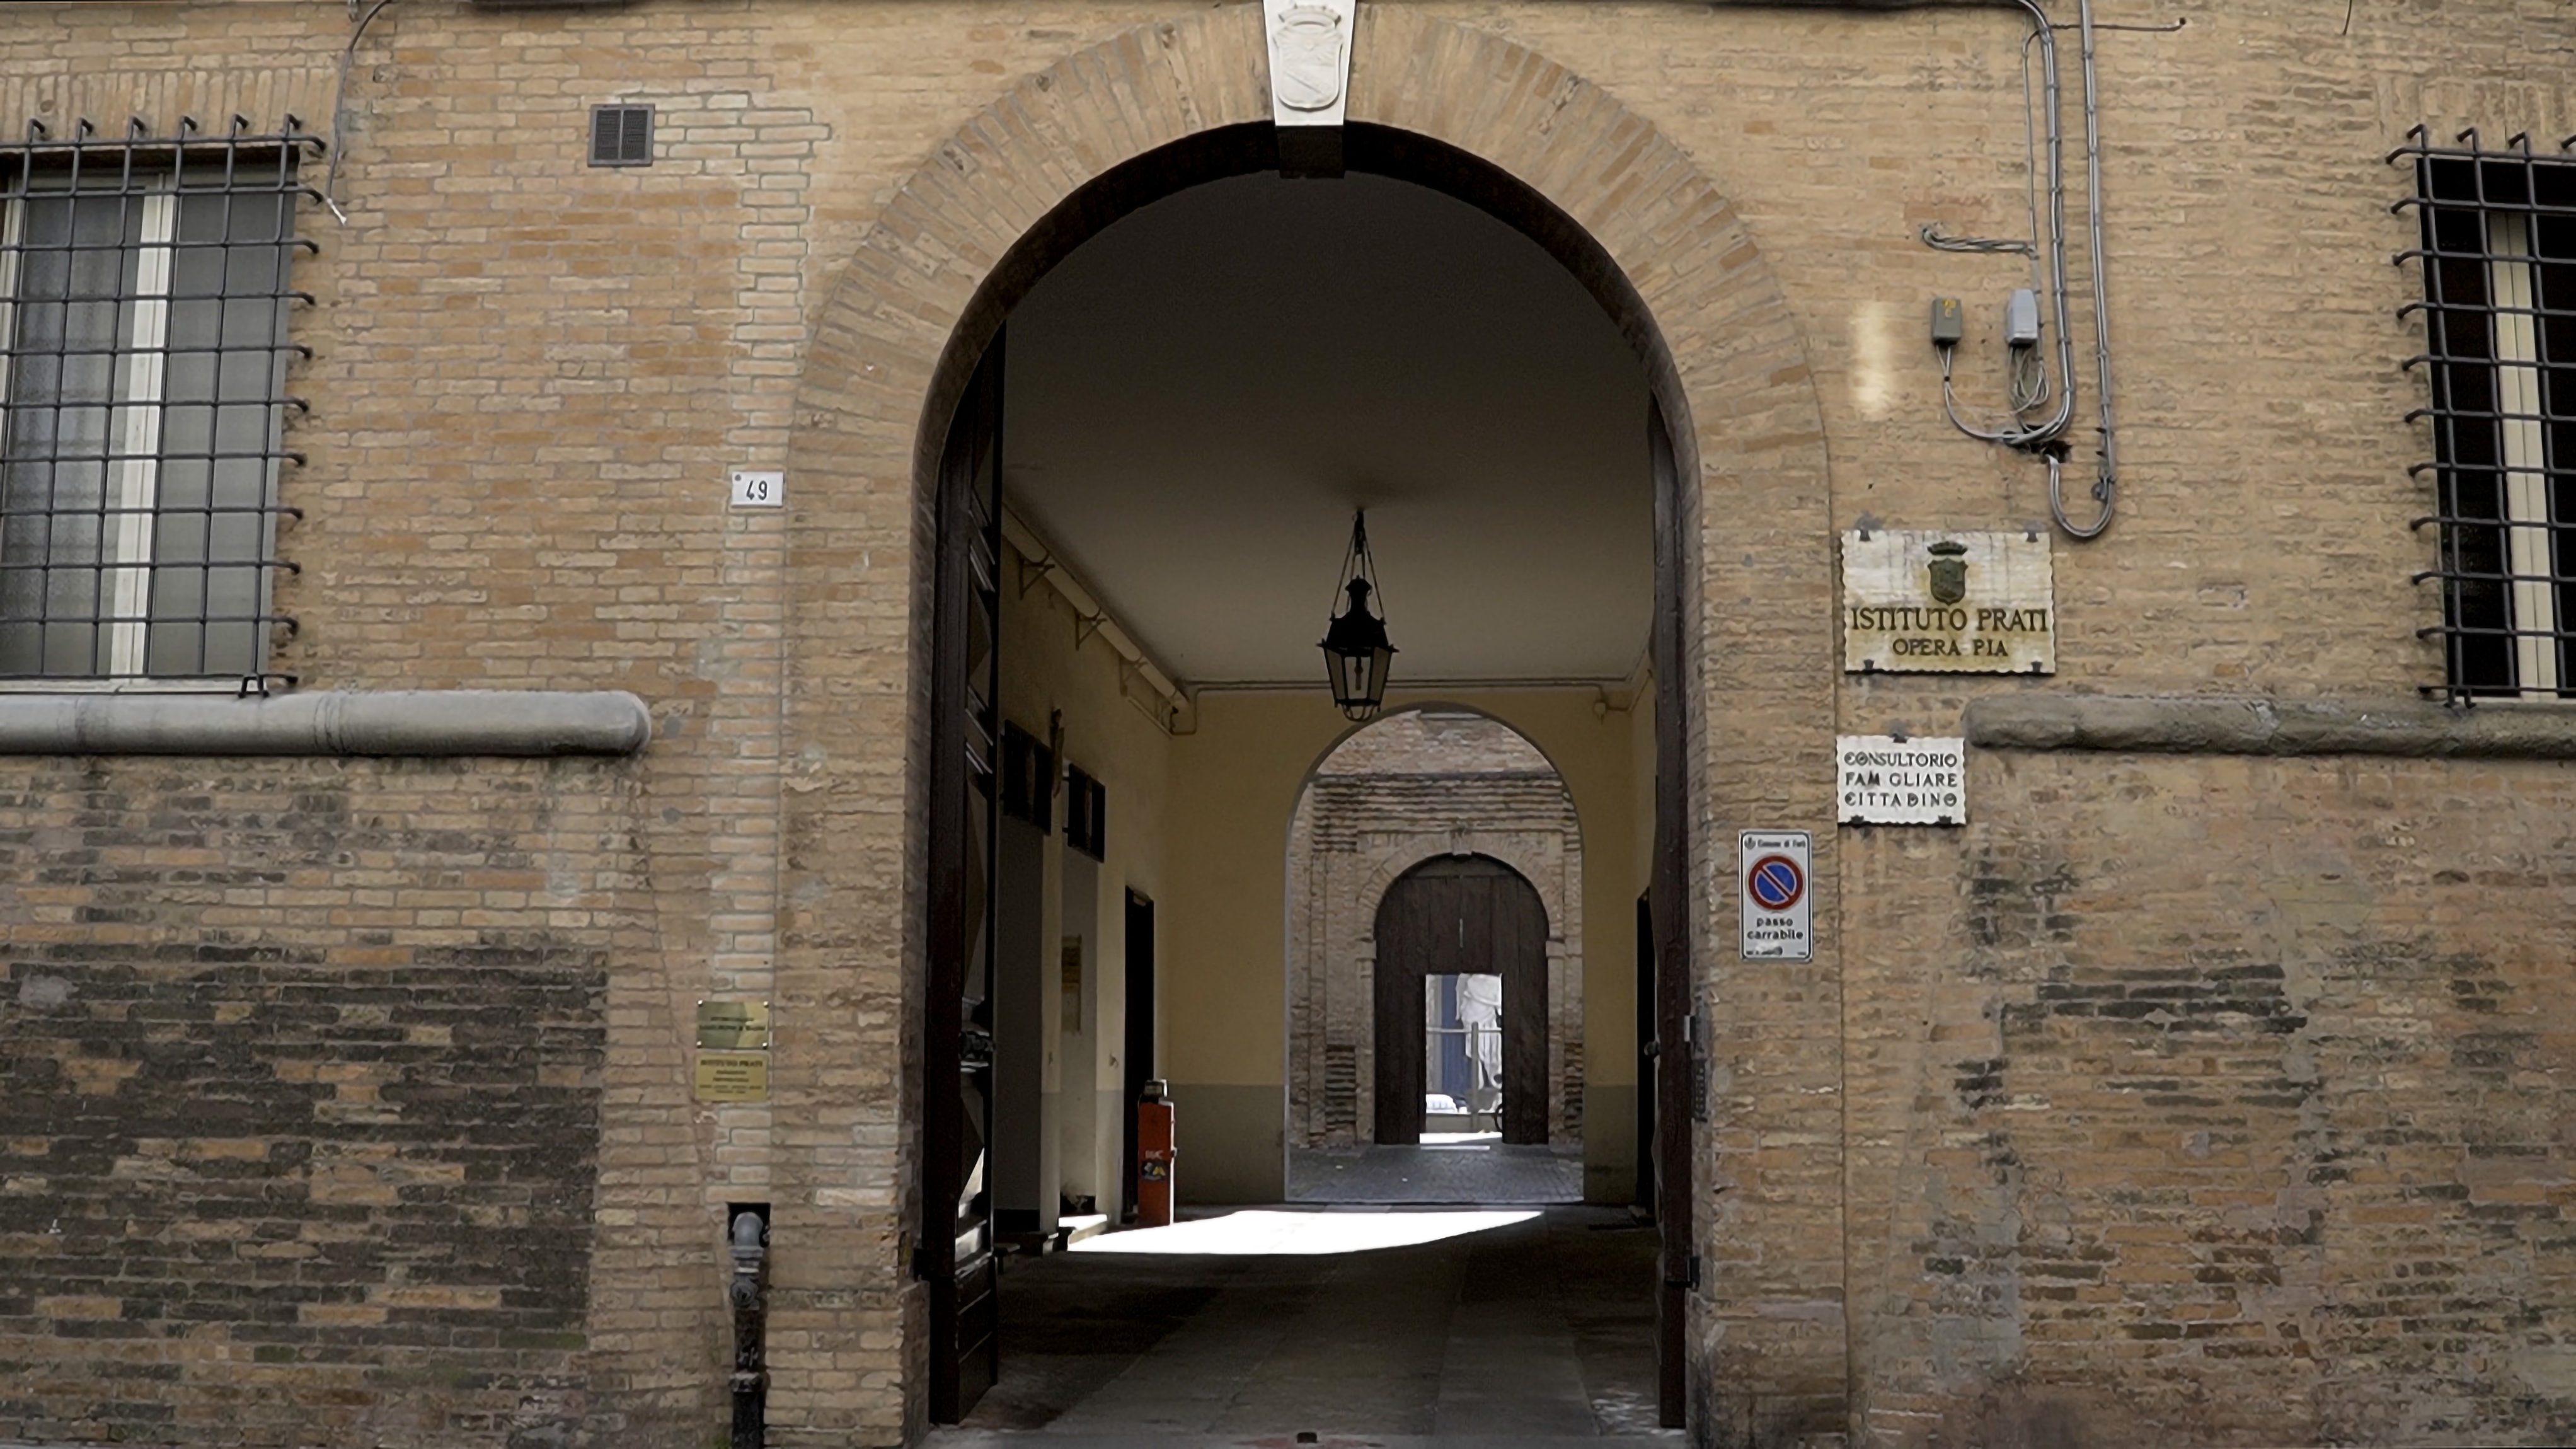 Istituto-Prati-Opera-Pia-Forlì